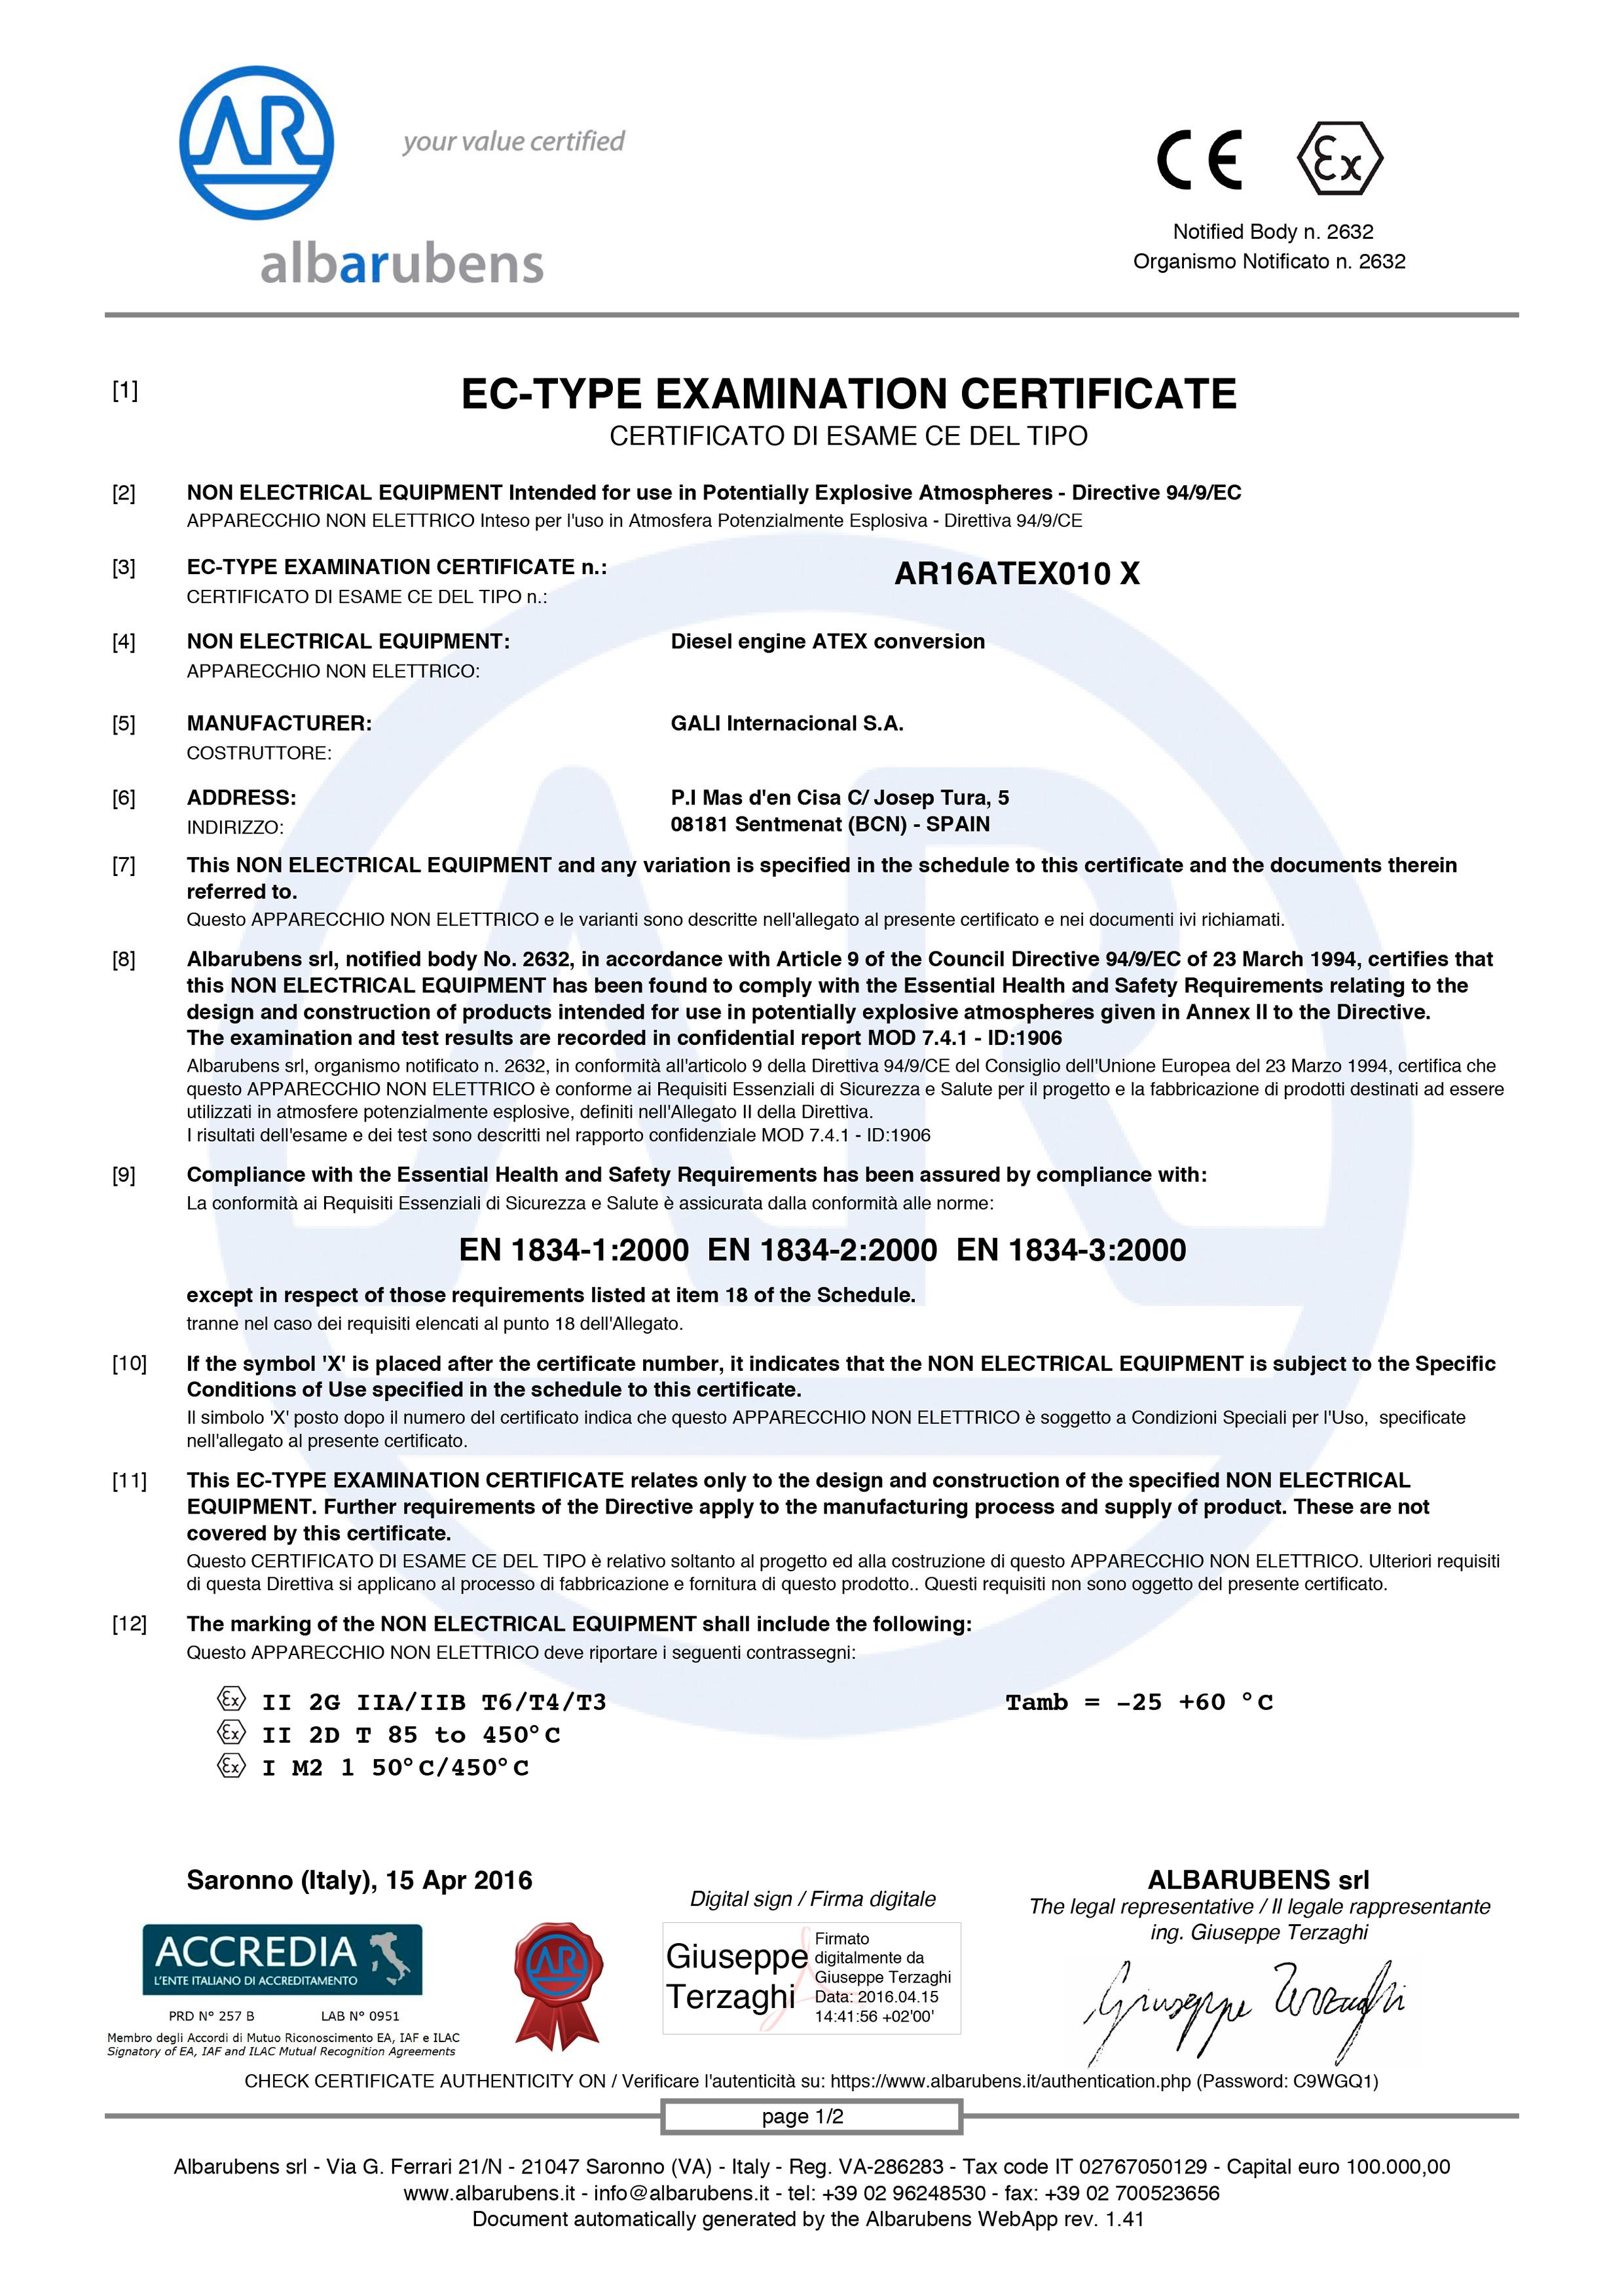 AR16ATEX010-X-1 certificate